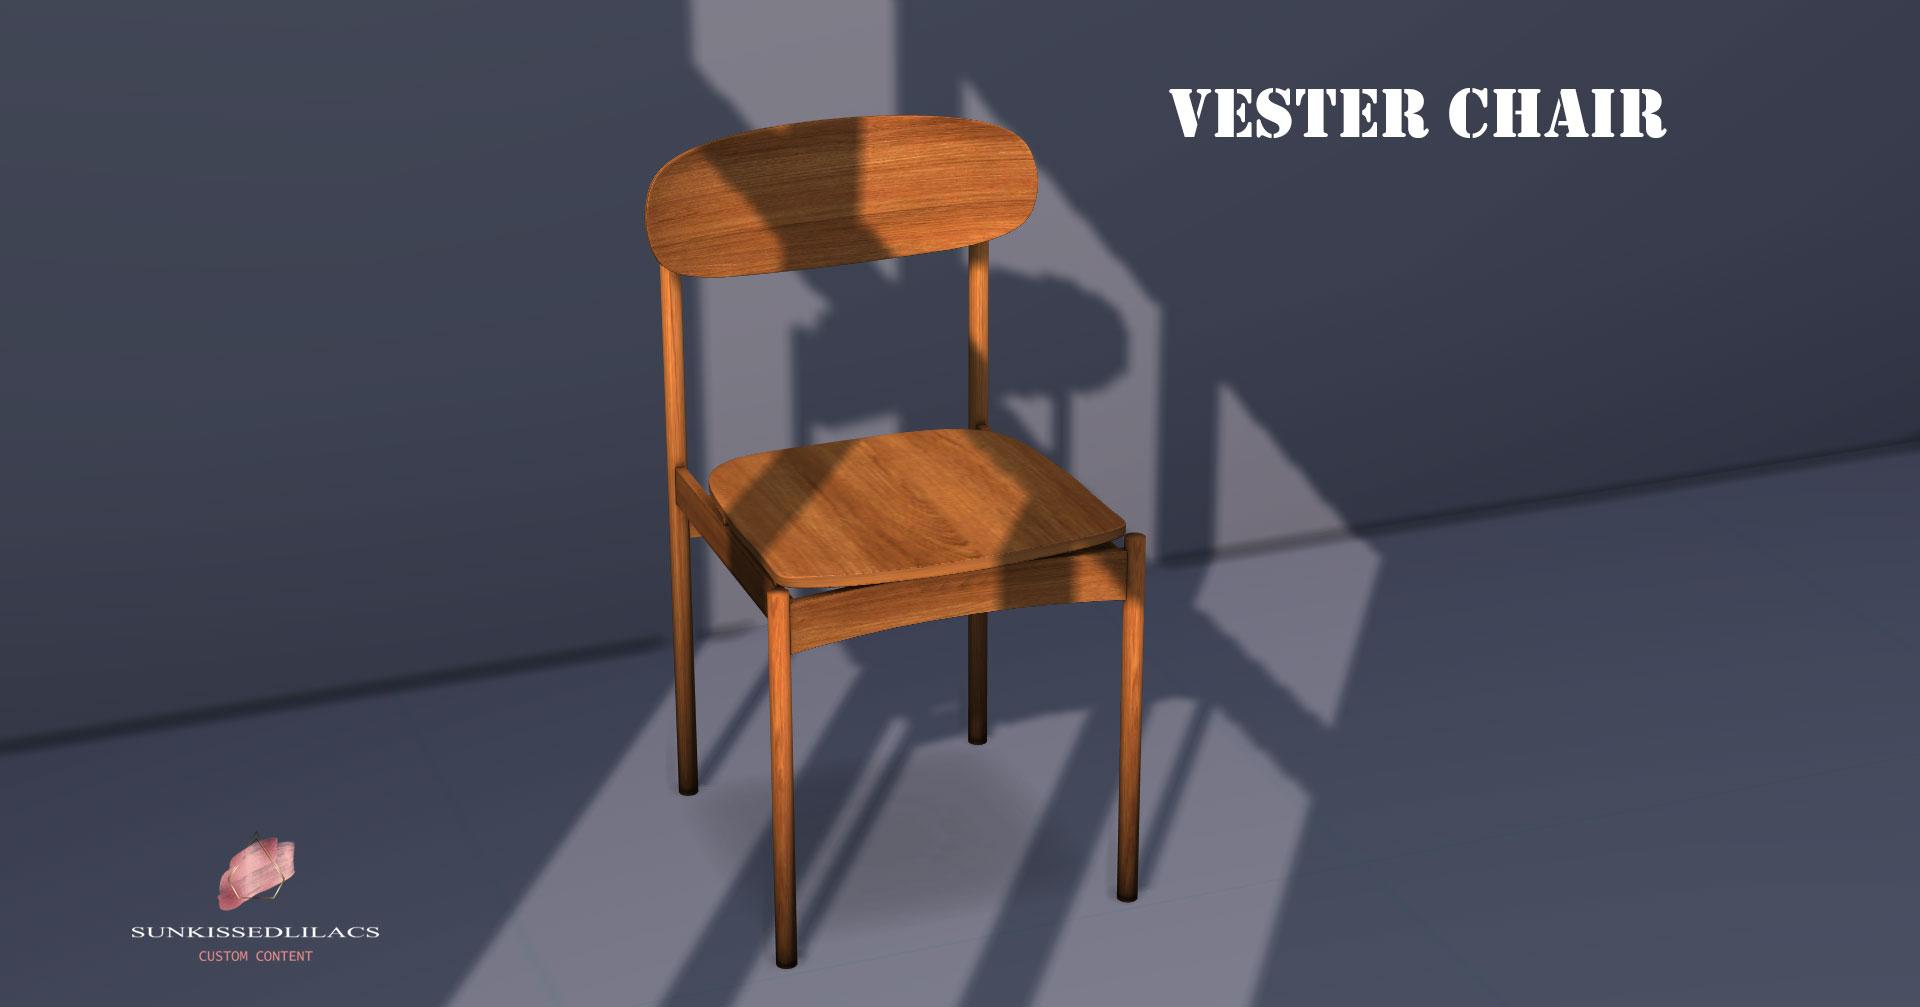 Vester Chair-sunkissedlilacs-simms-4-custom-content